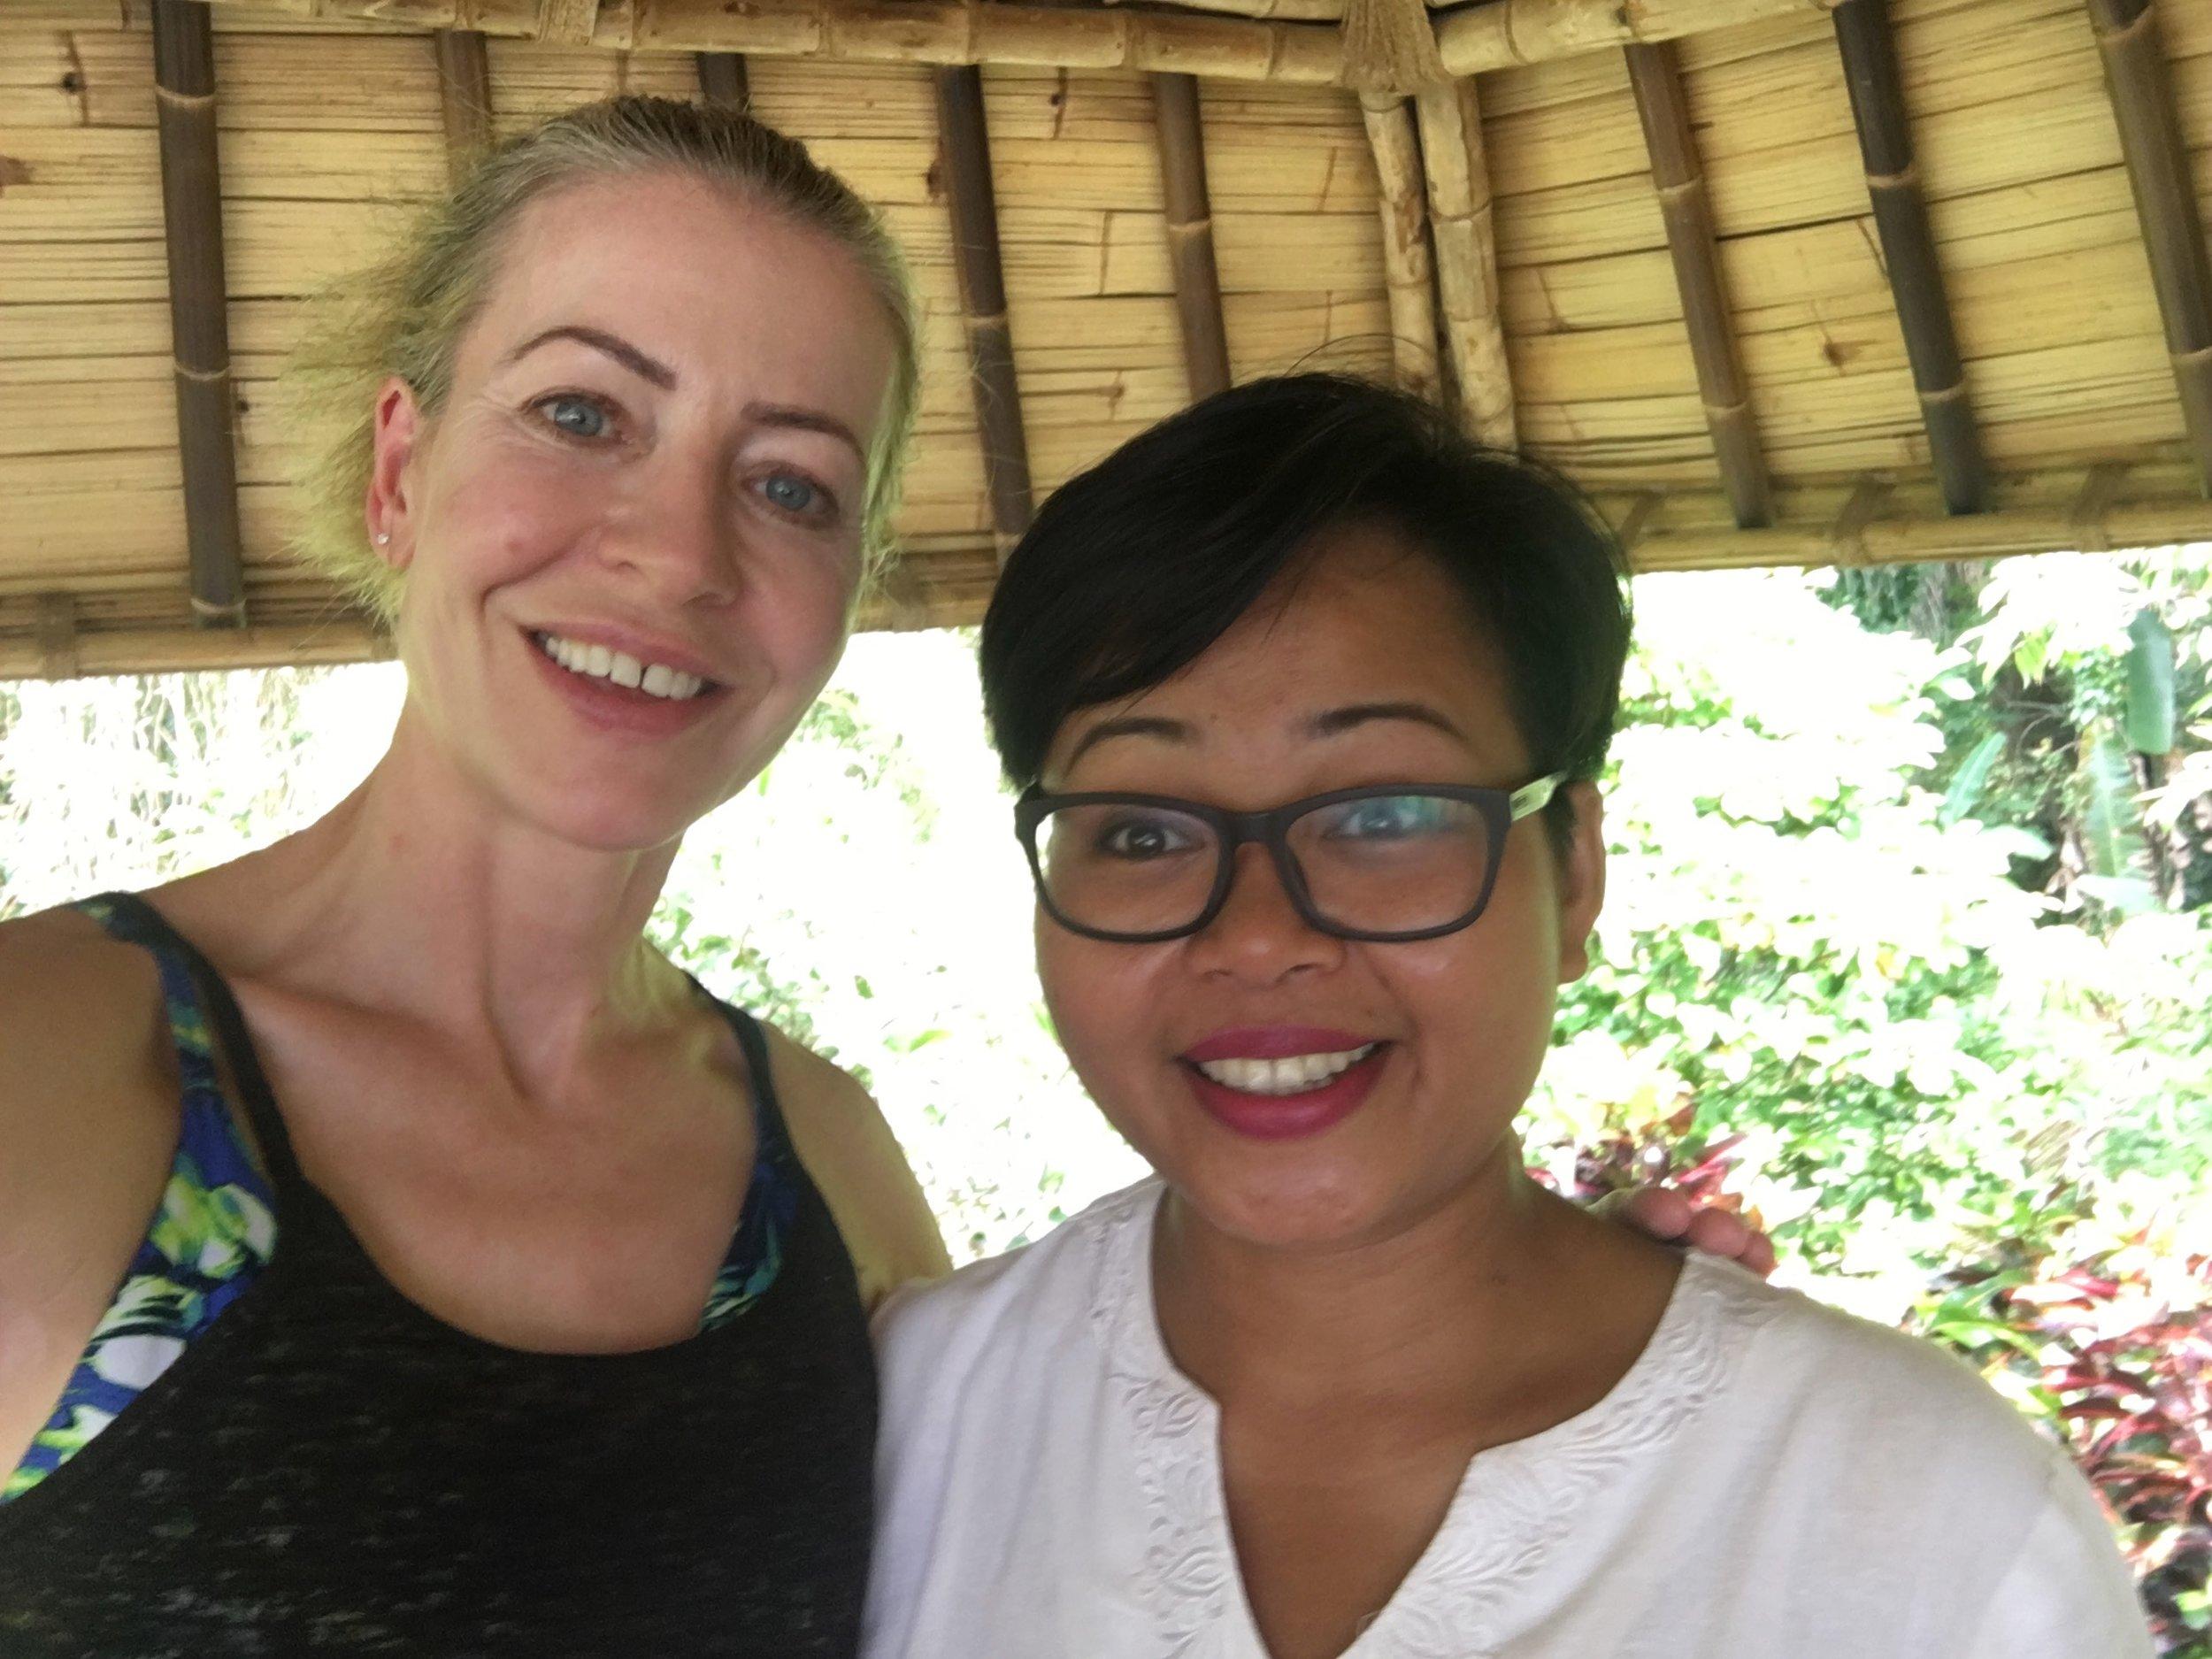 Here I am with Ibu Fera, who runs the wellness program at Sayan.